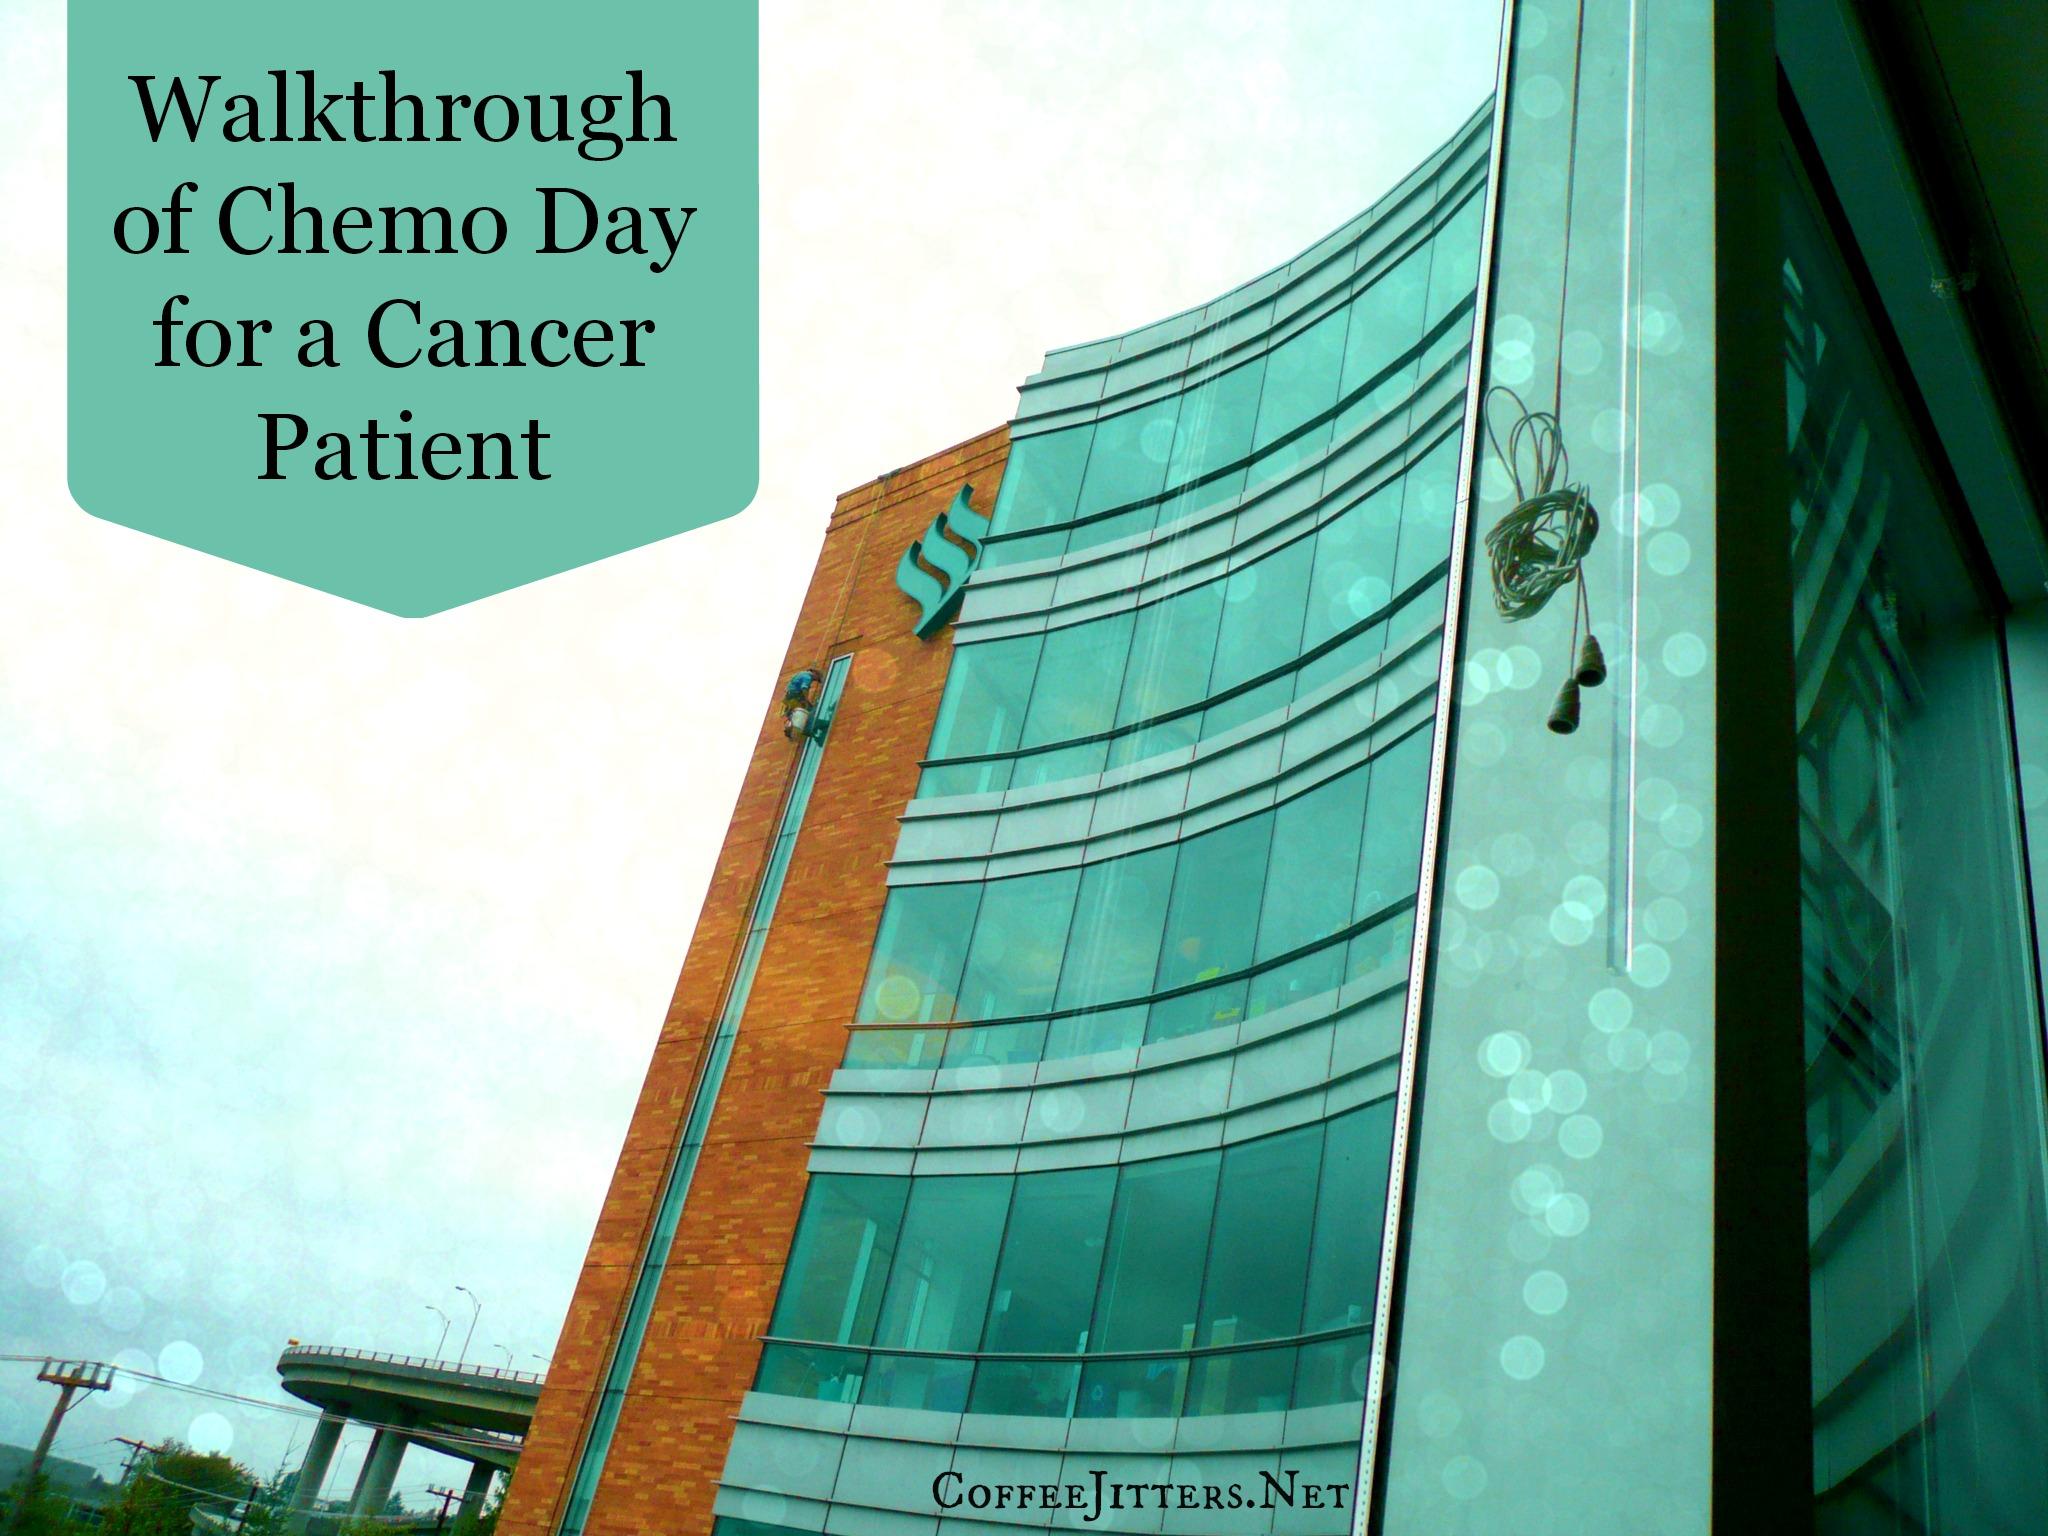 Walkthrough of Chemo Day